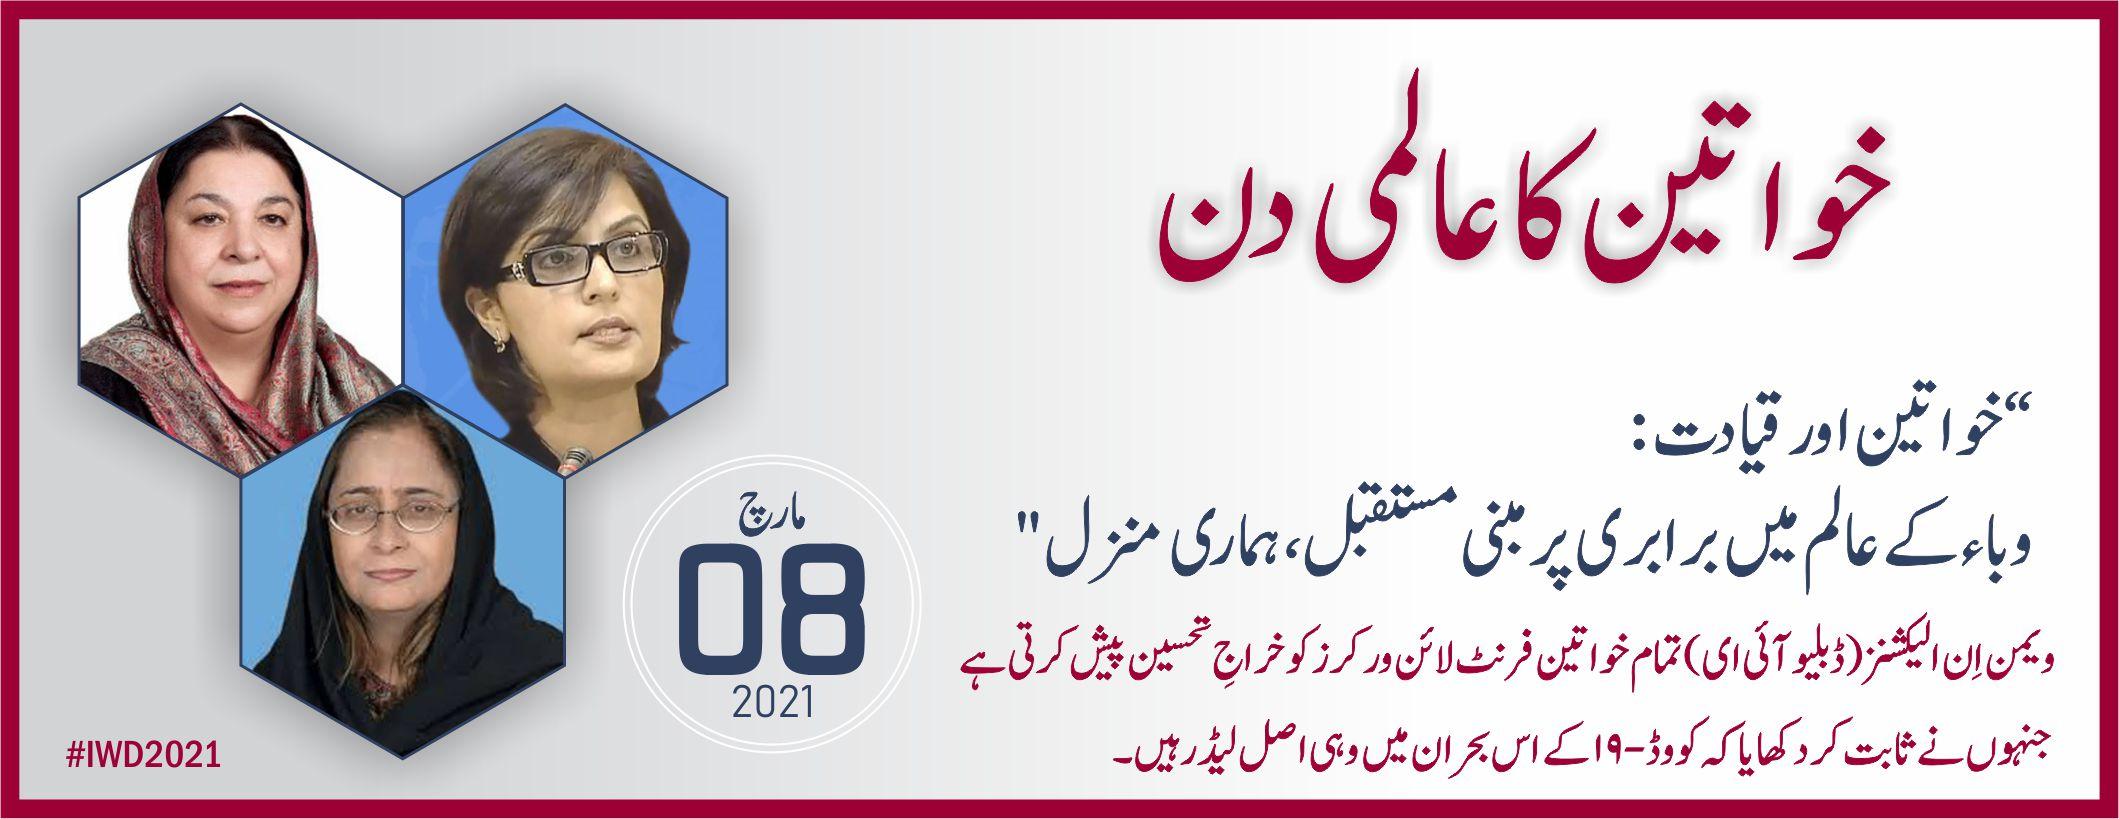 pakvoter-women-in-elections-pakistan-elections-wie-banner-covid-19-coronavirus-outbreak-message-women-safety-banner